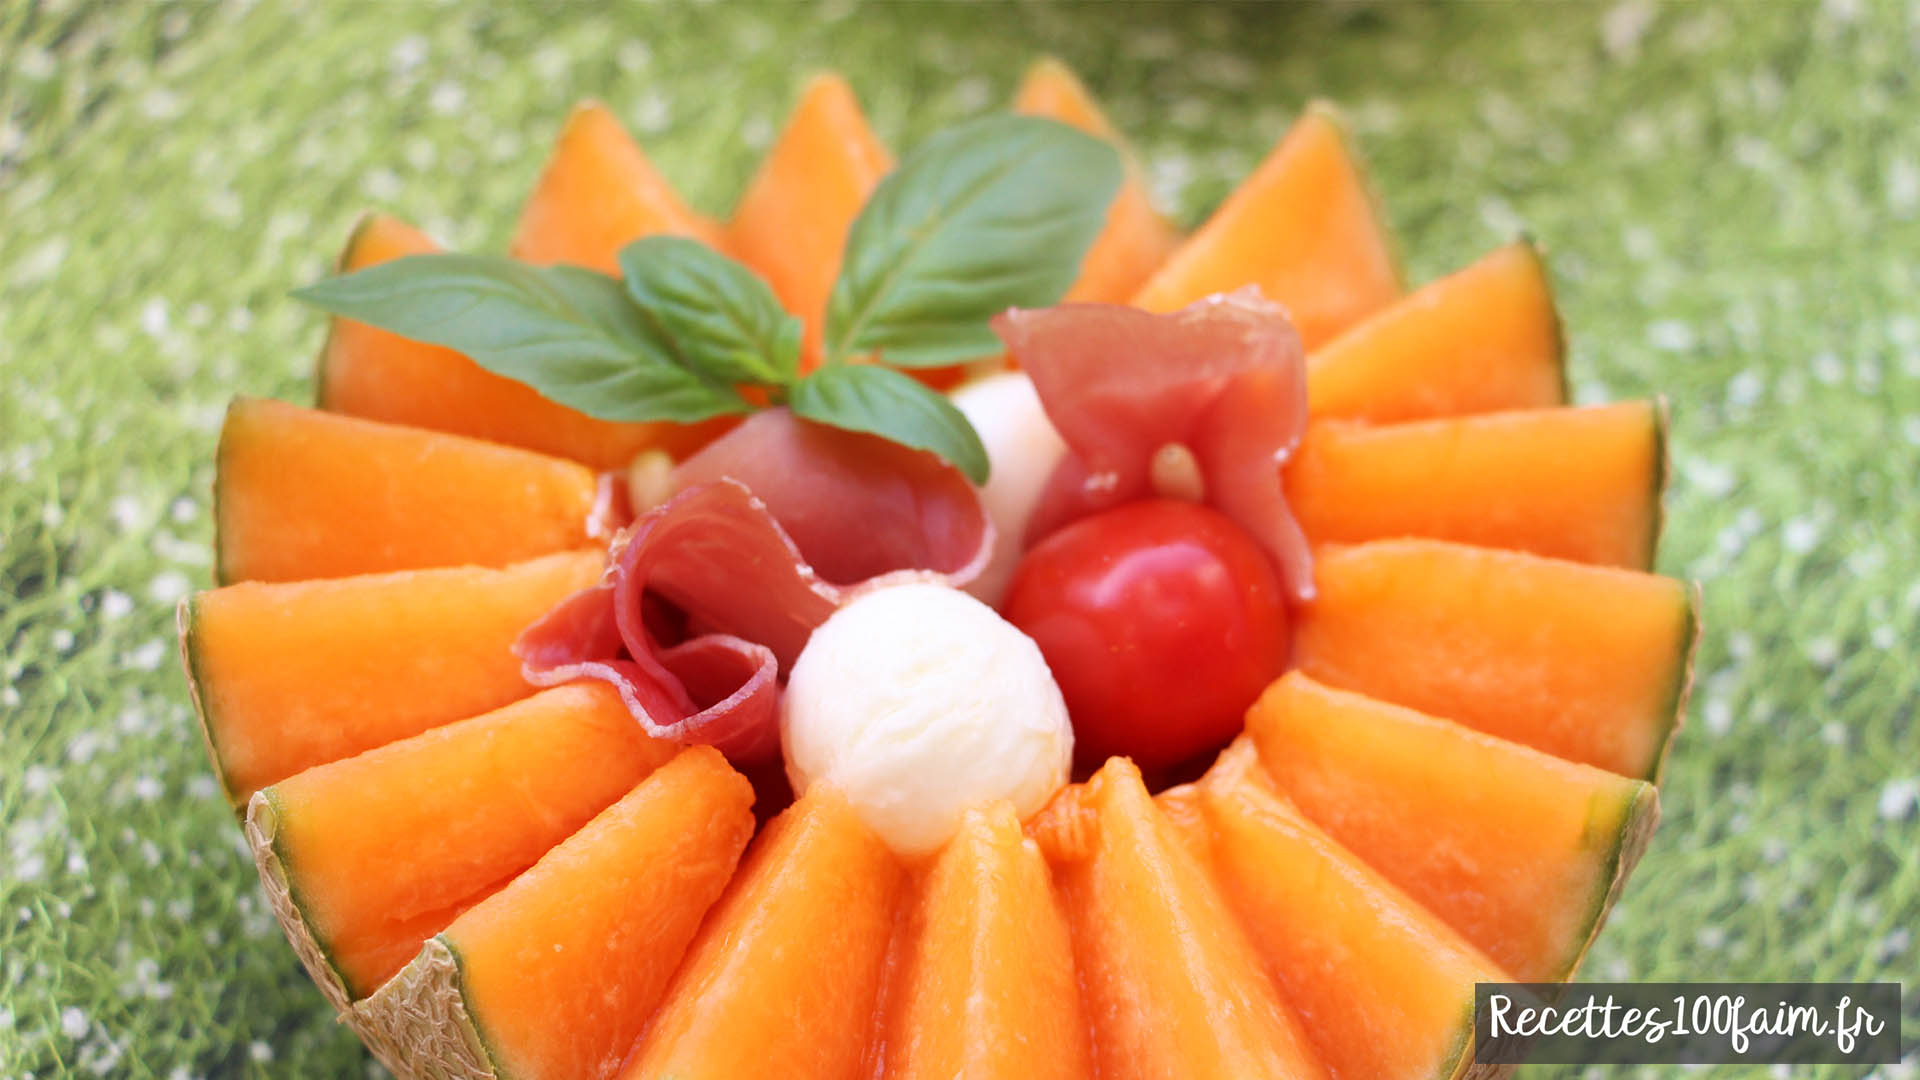 Recette gourmande de jambon cru melon et basilic